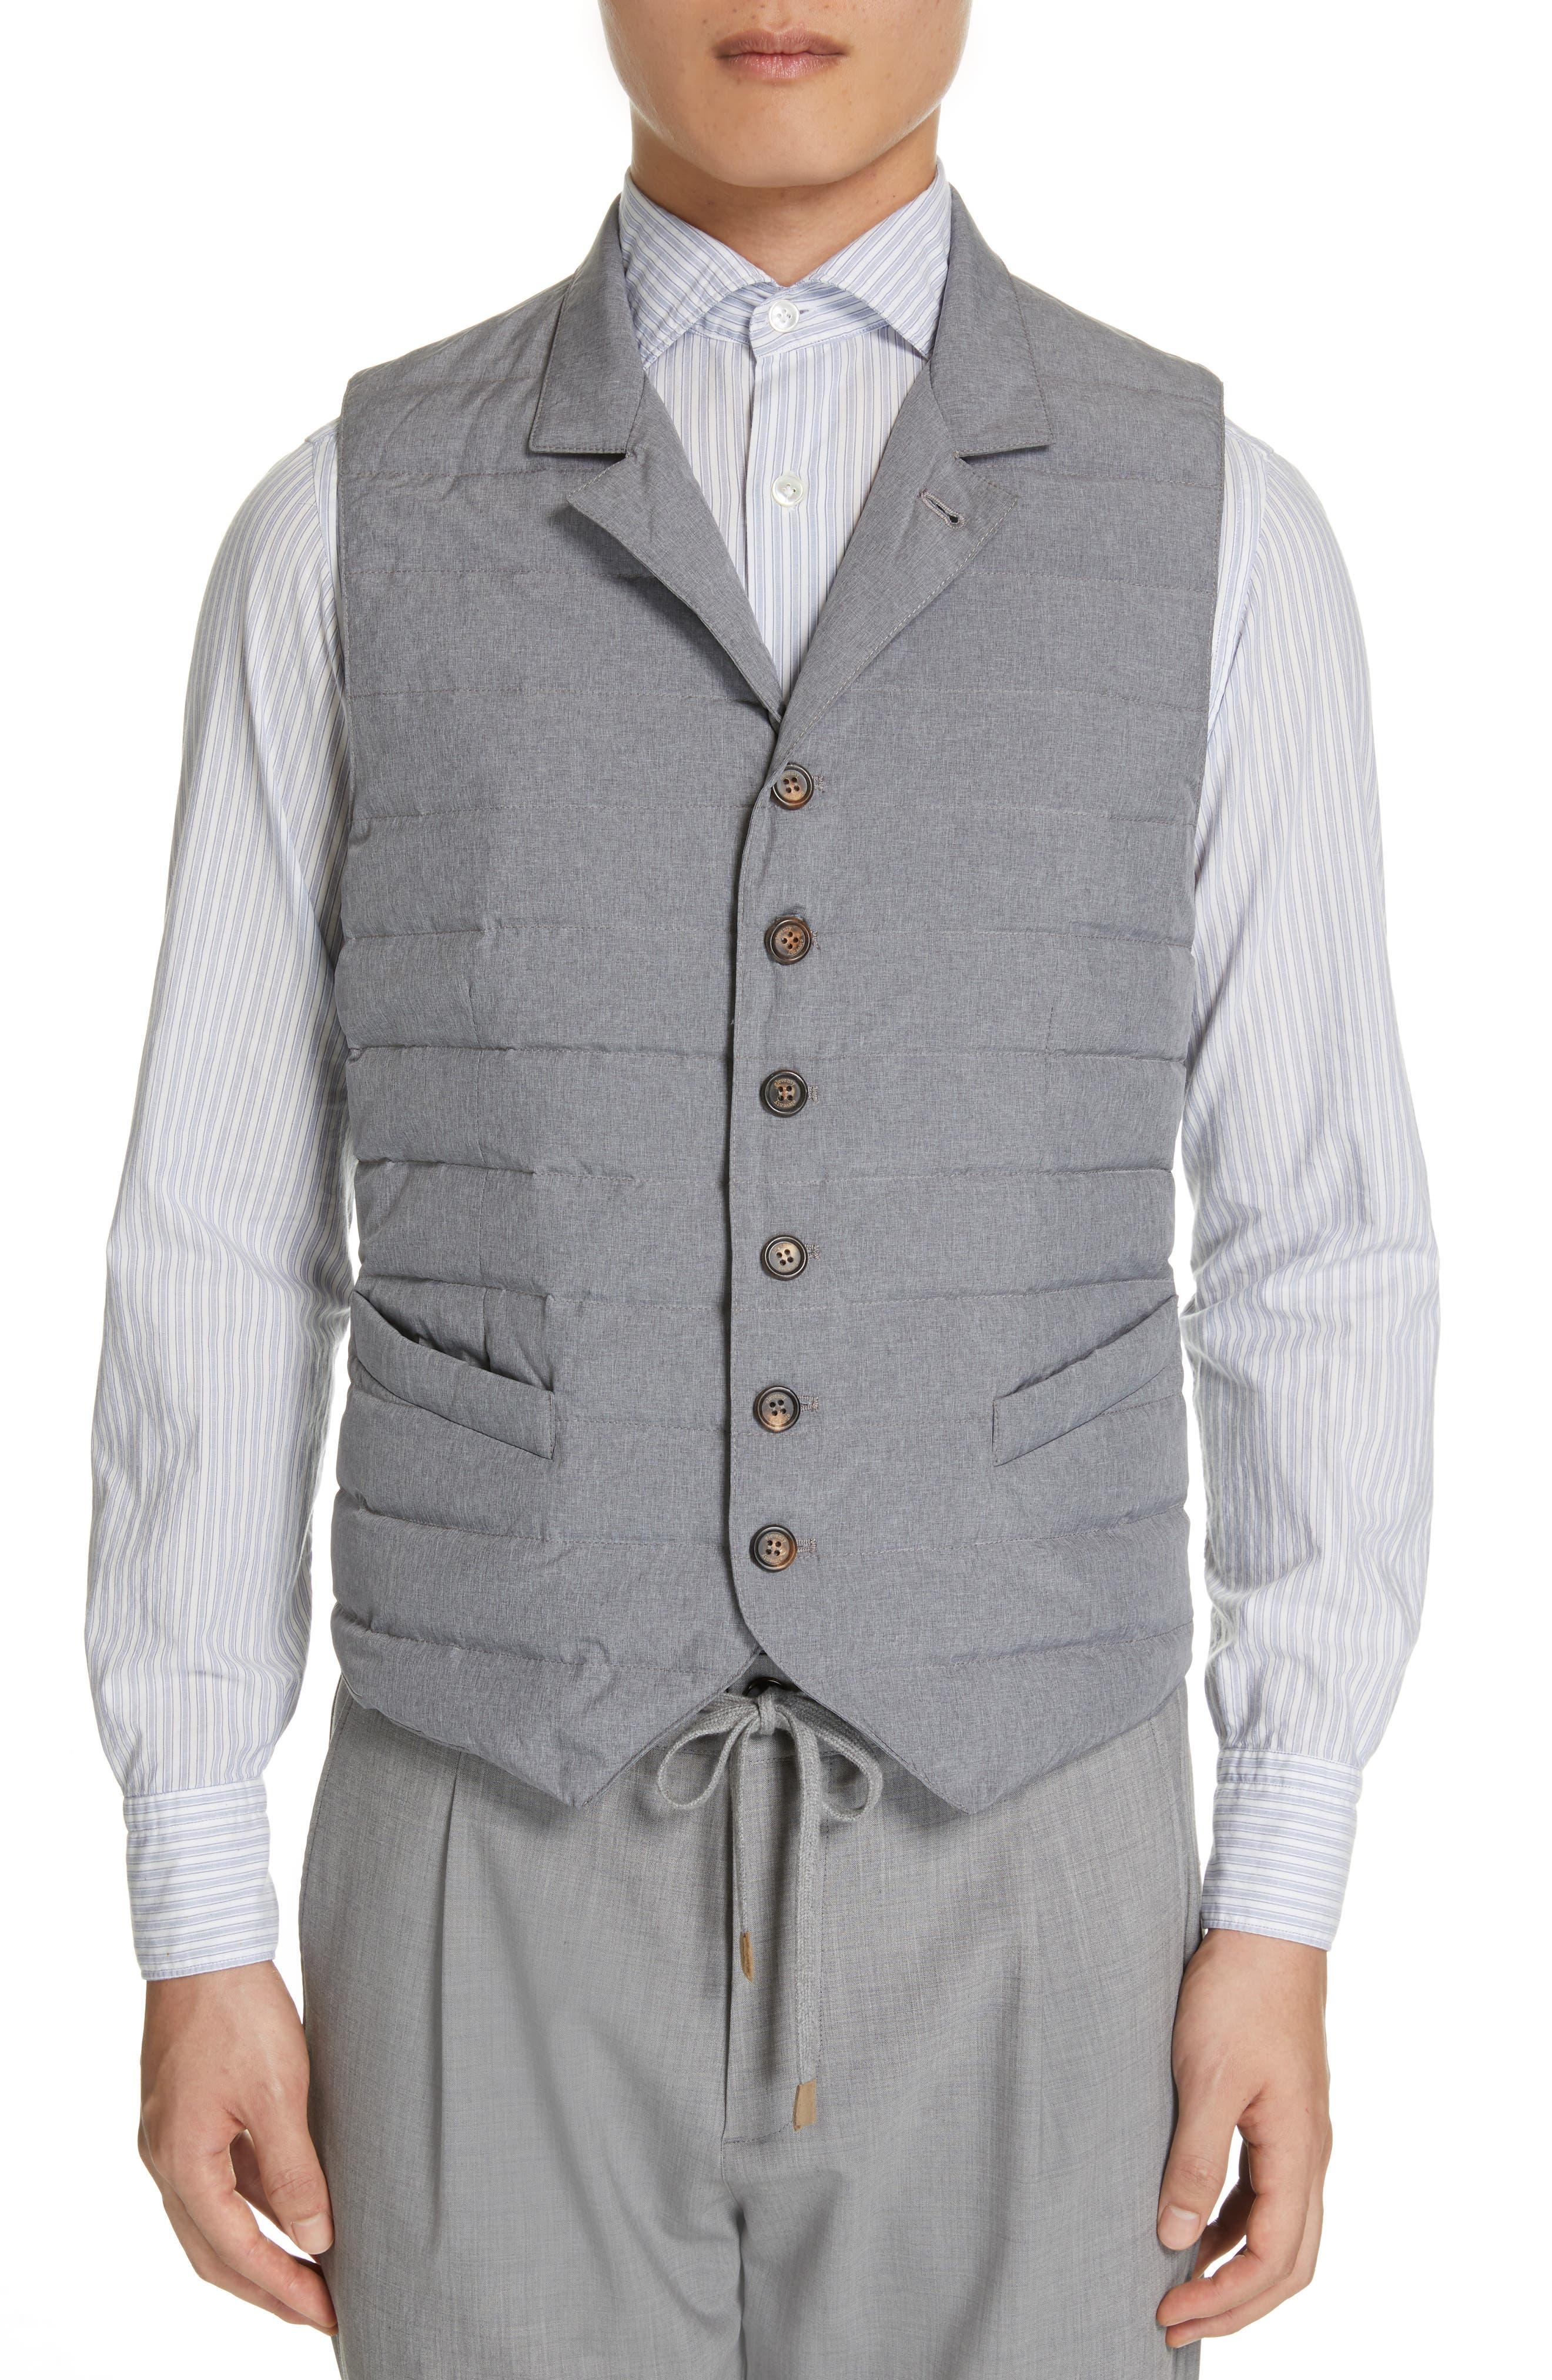 Vesta adidas originals slim vest